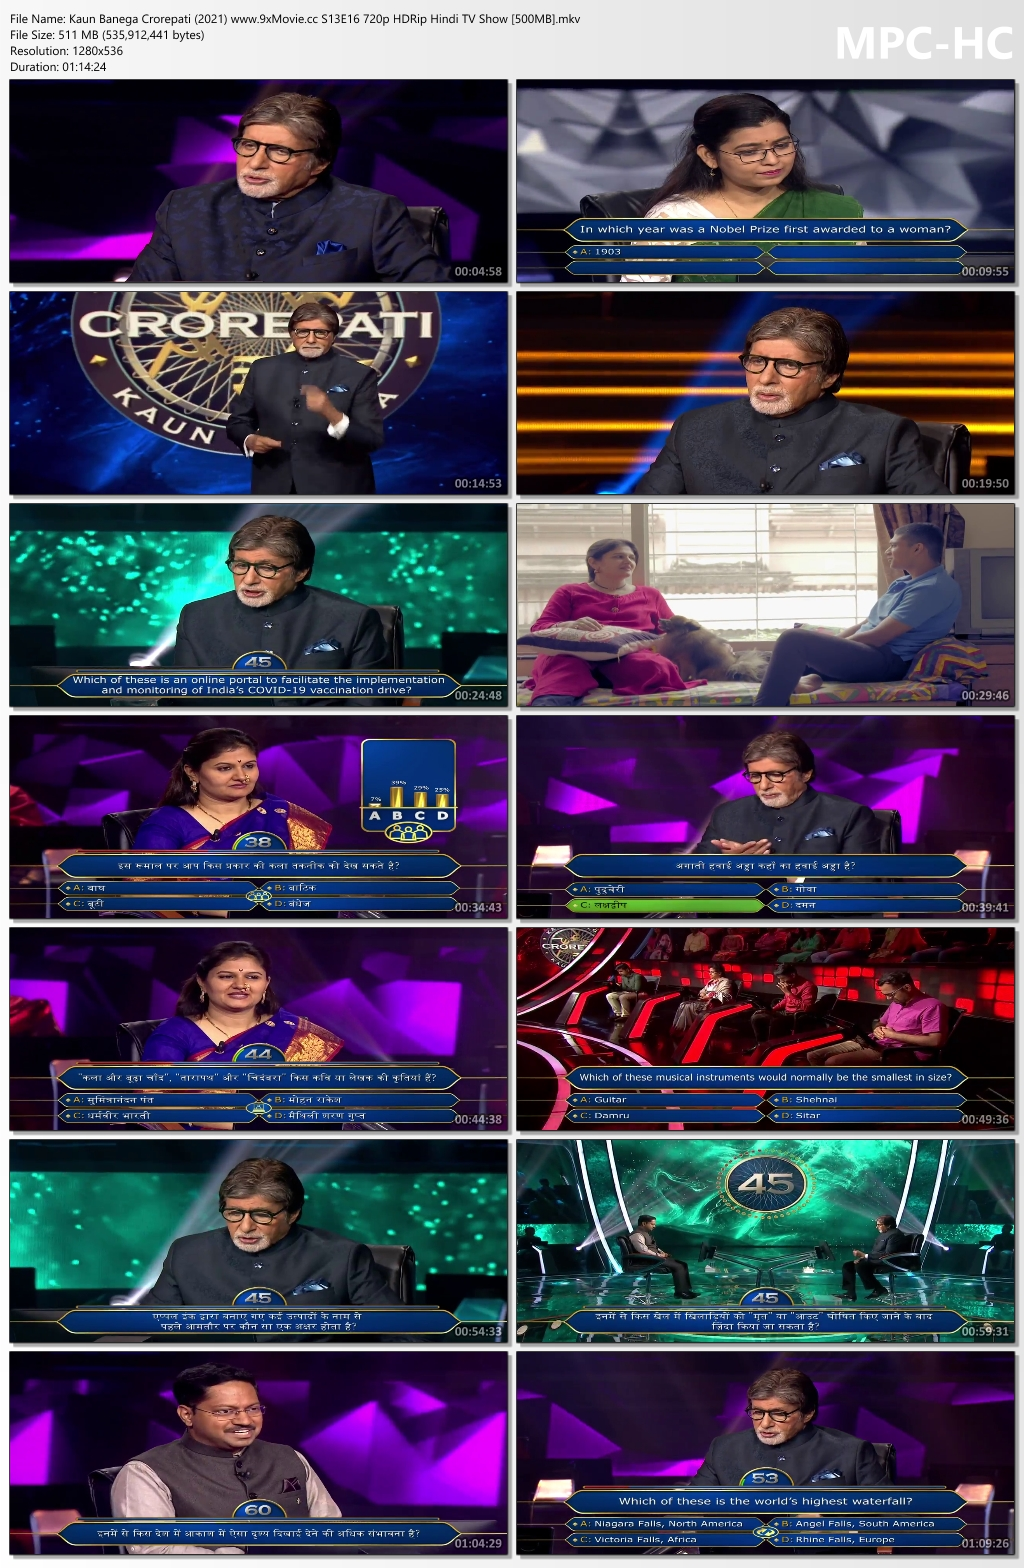 Kaun-Banega-Crorepati-2021-www-9x-Movie-cc-S13-E16-720p-HDRip-Hindi-TV-Show-500-MB-mkv